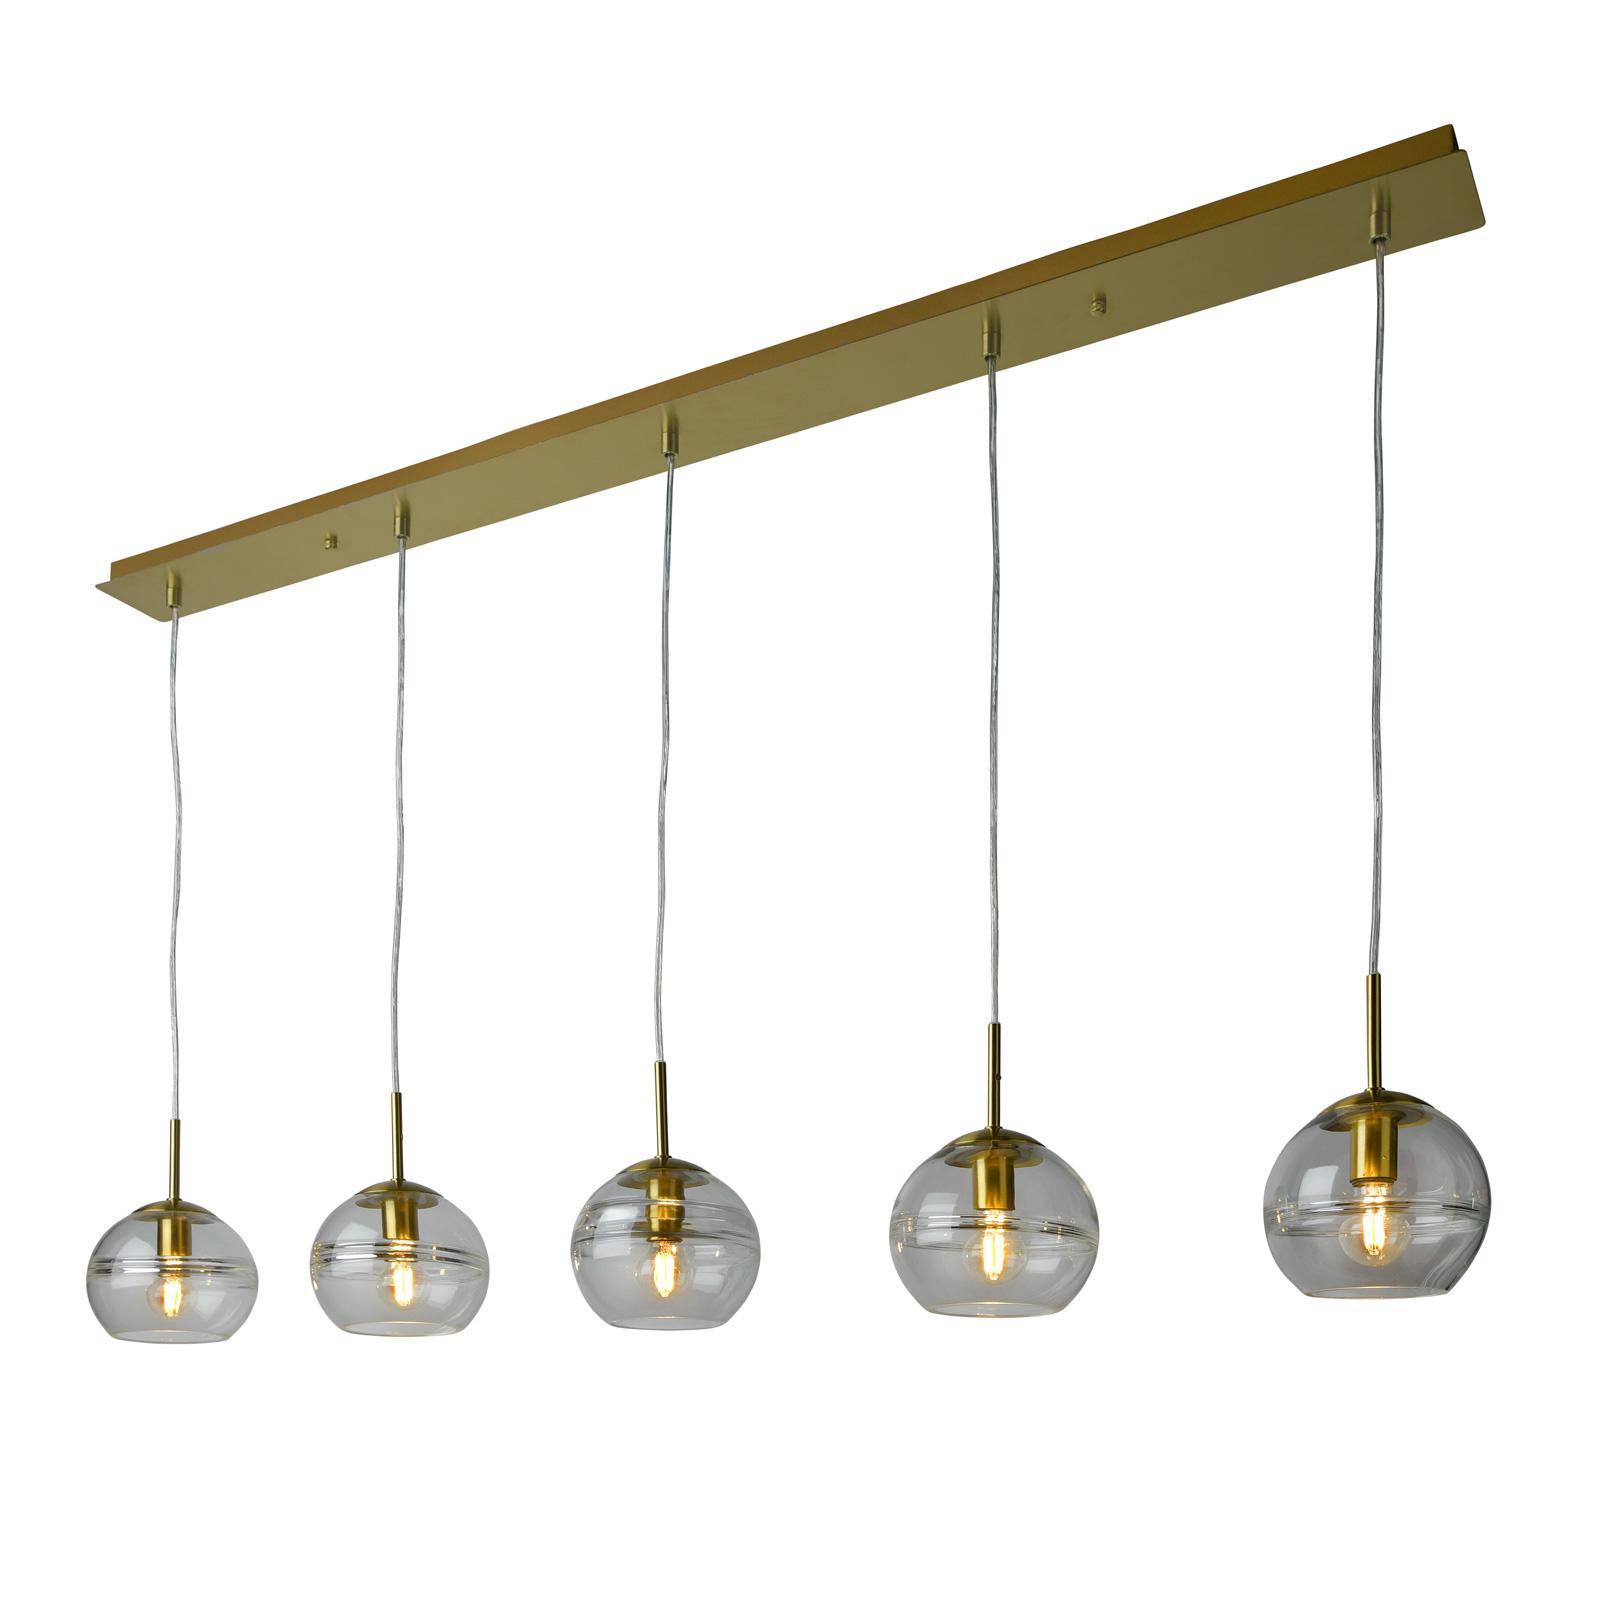 Villeroy & Boch Tokyo hængelampe 5 lyskilder, guld